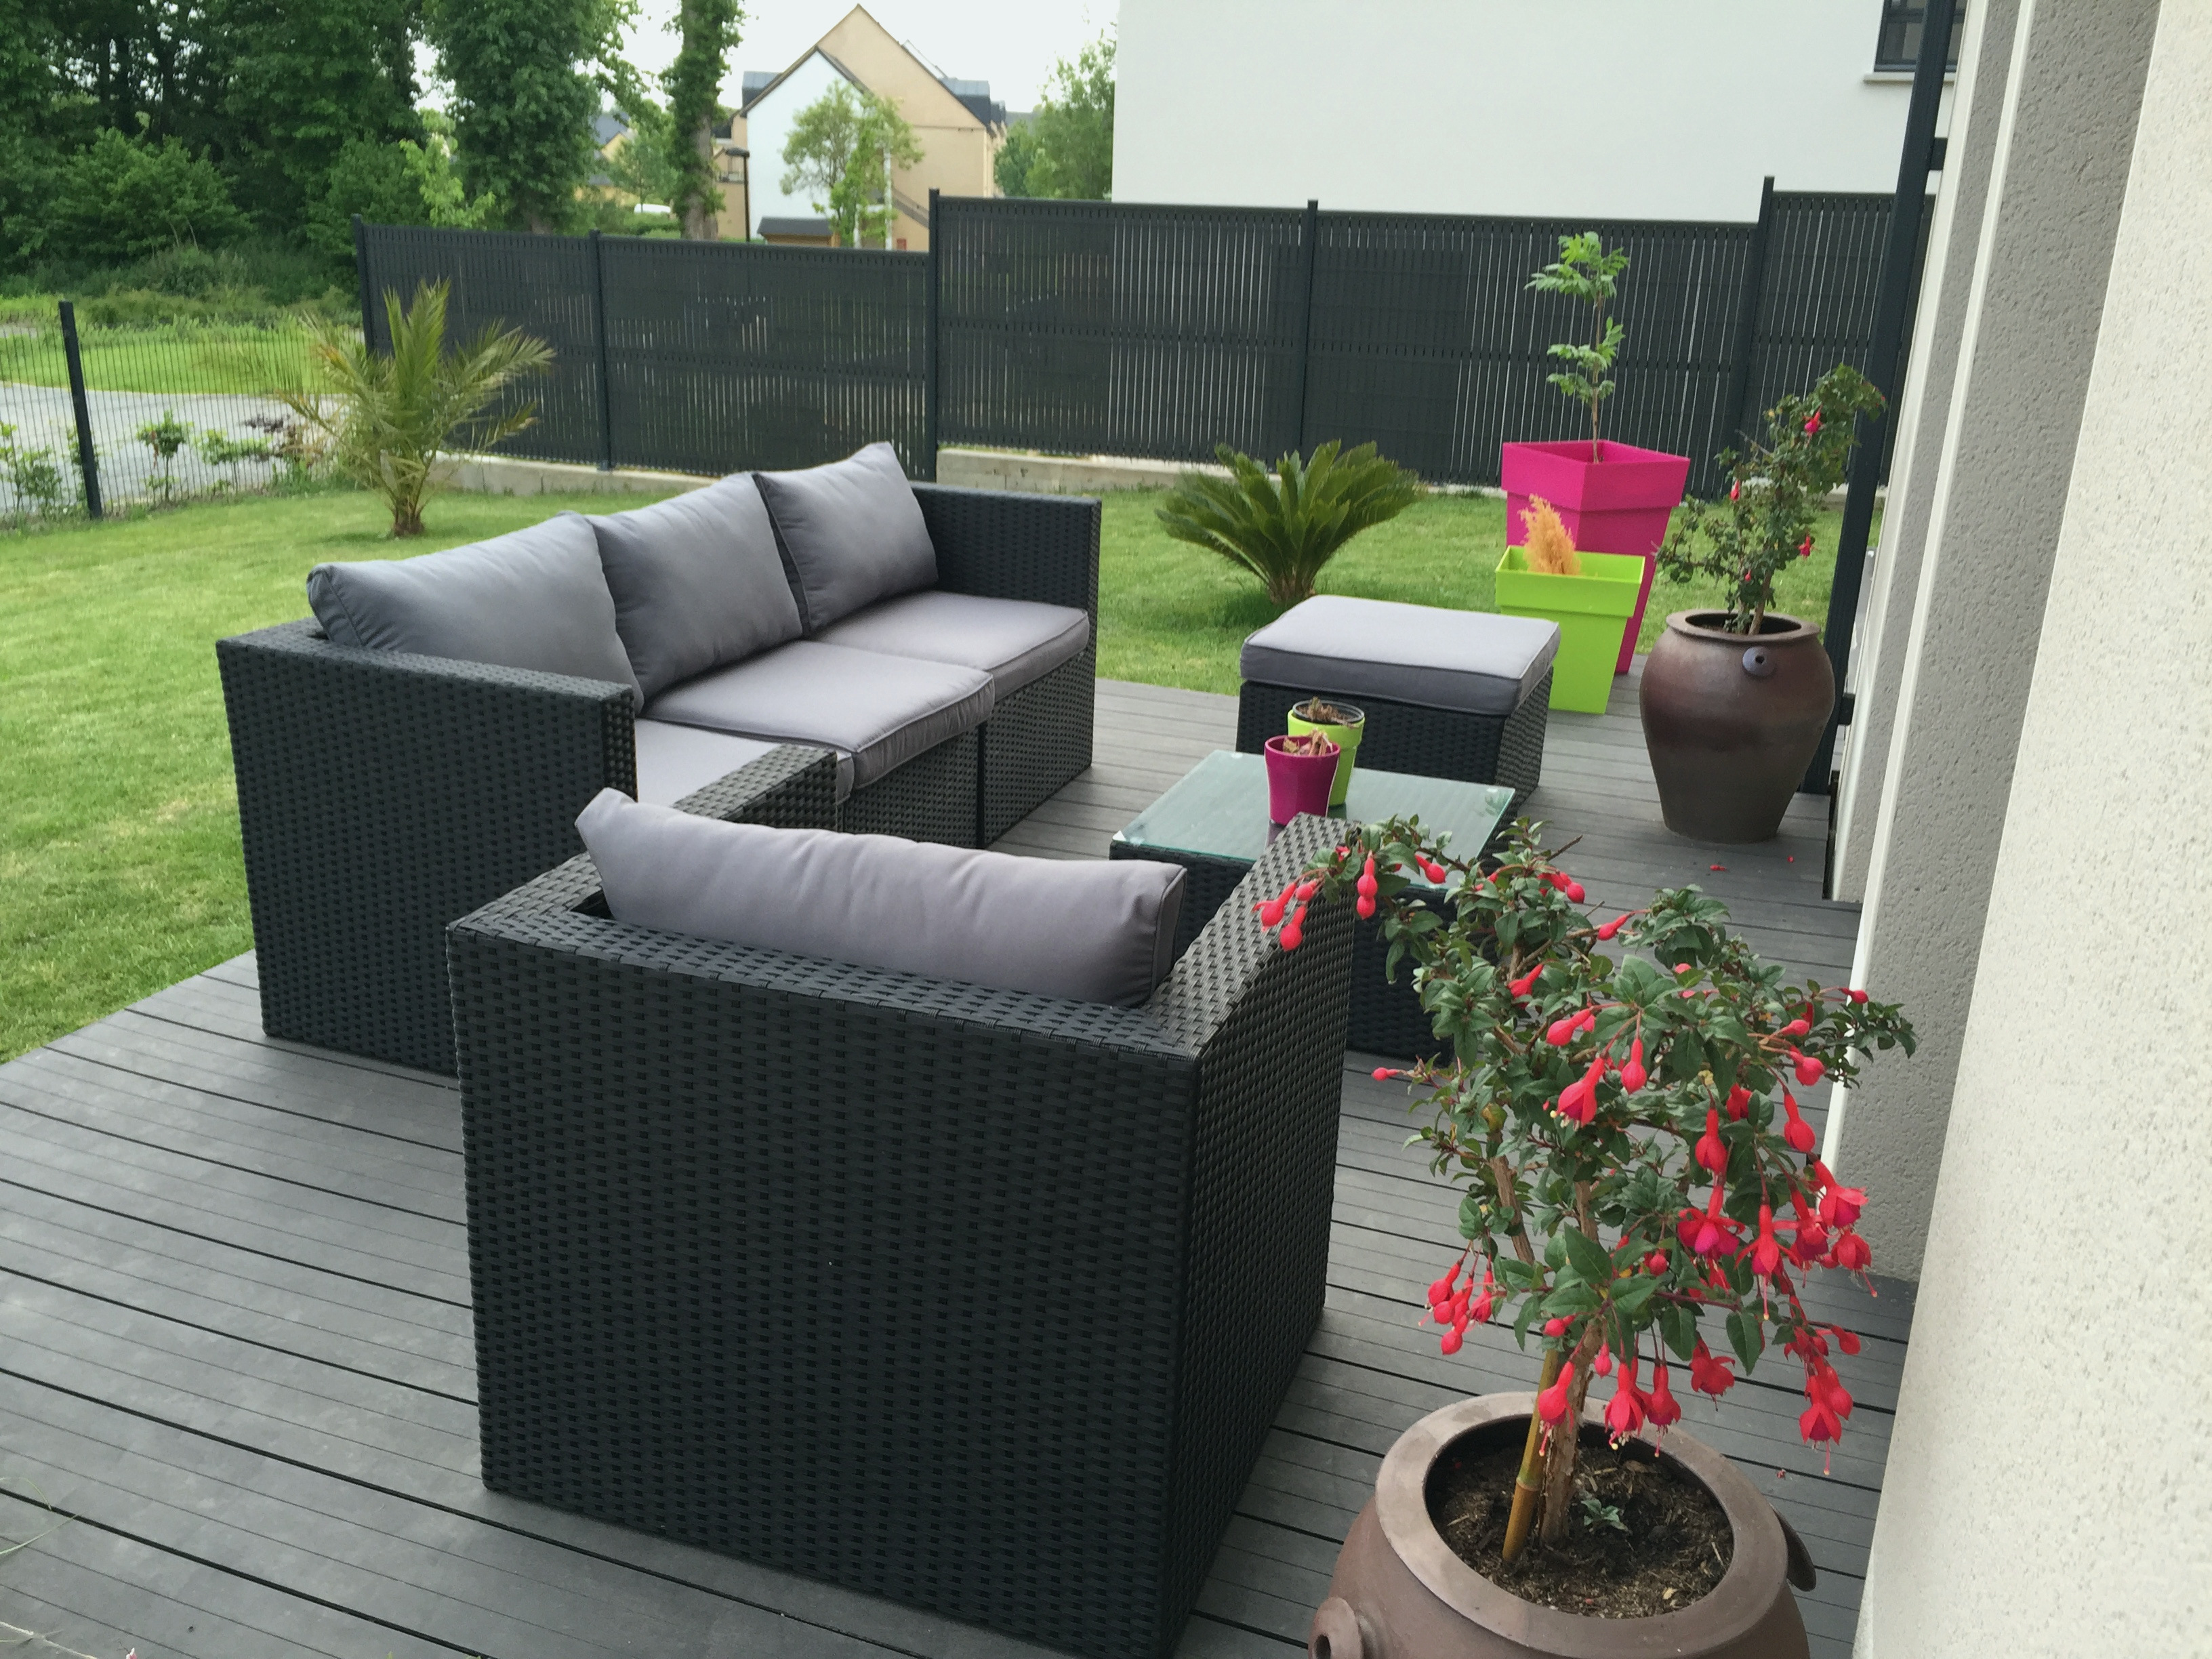 Awesome Veranda Jardin Savini Pictures - House Design - marcomilone.com